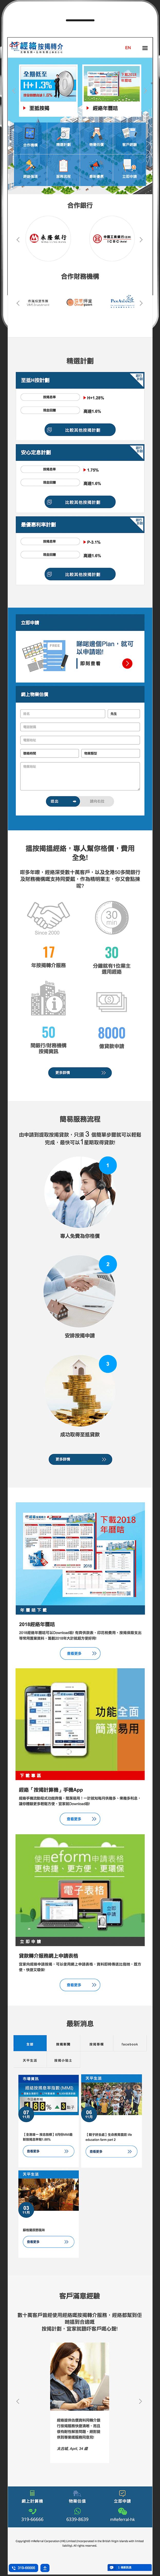 mReferral Corporation (HK) Limited